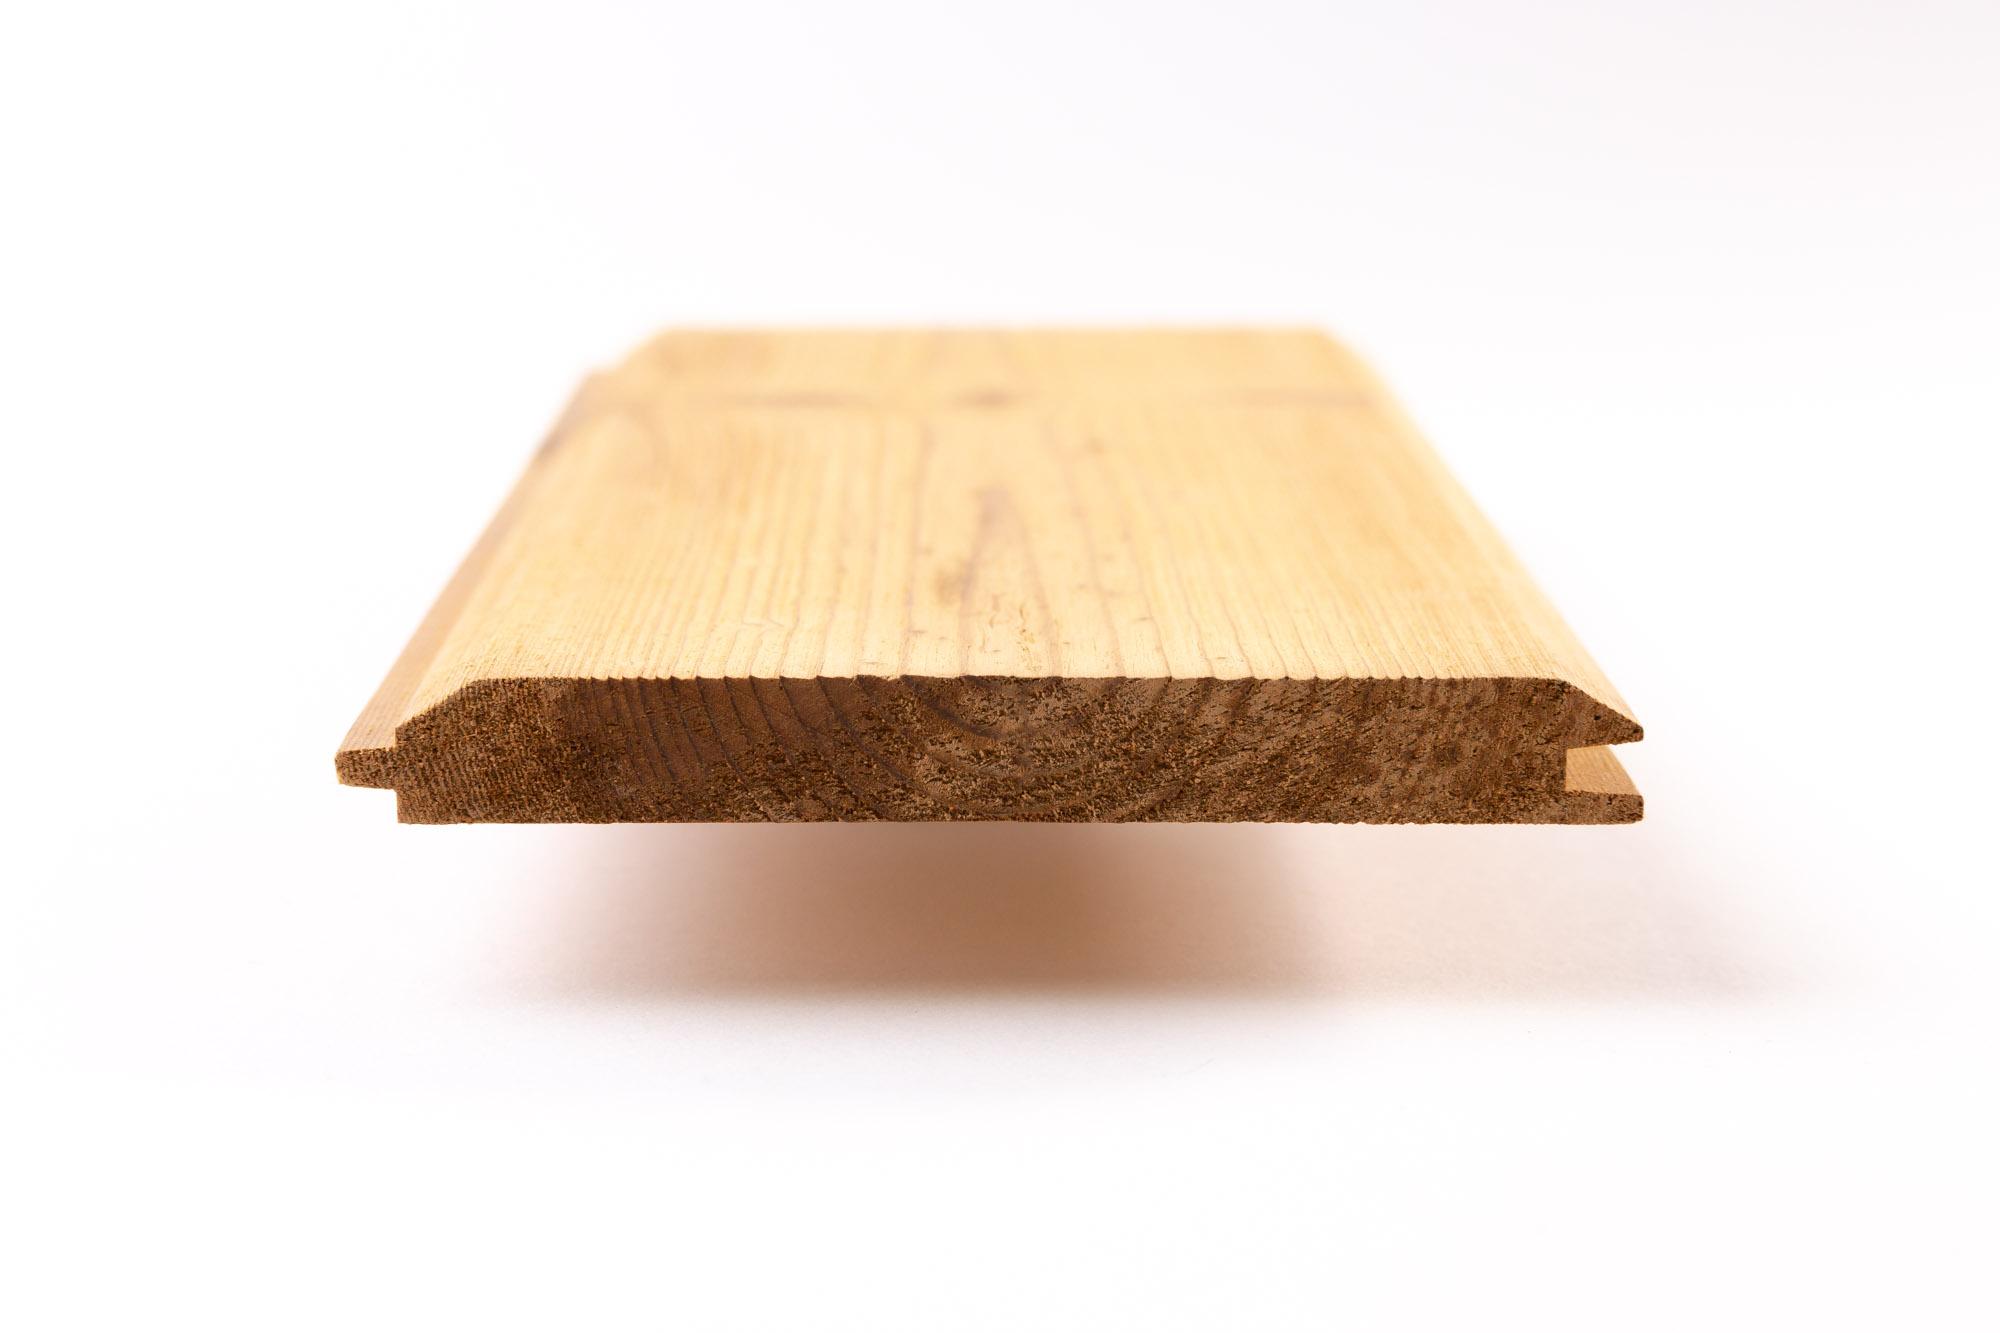 Pondorosa Pine Siding 1x6 WP4